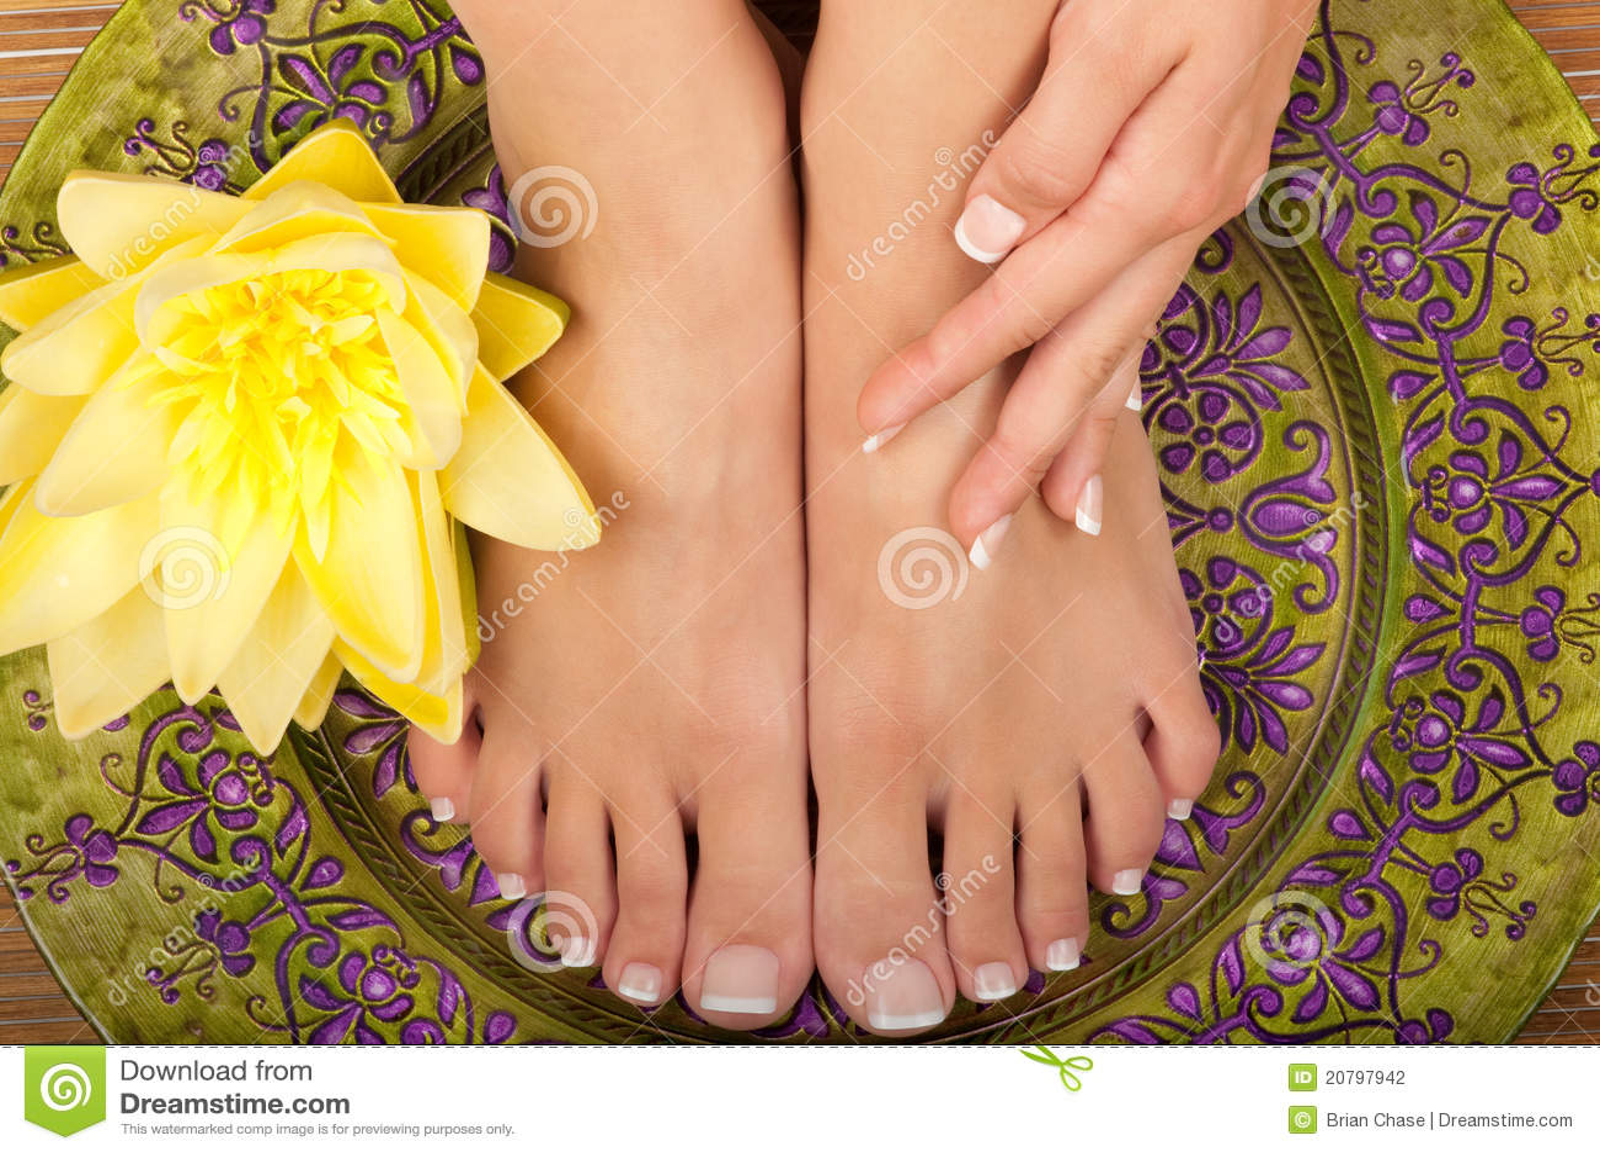 Pedicure and Manicure Spa